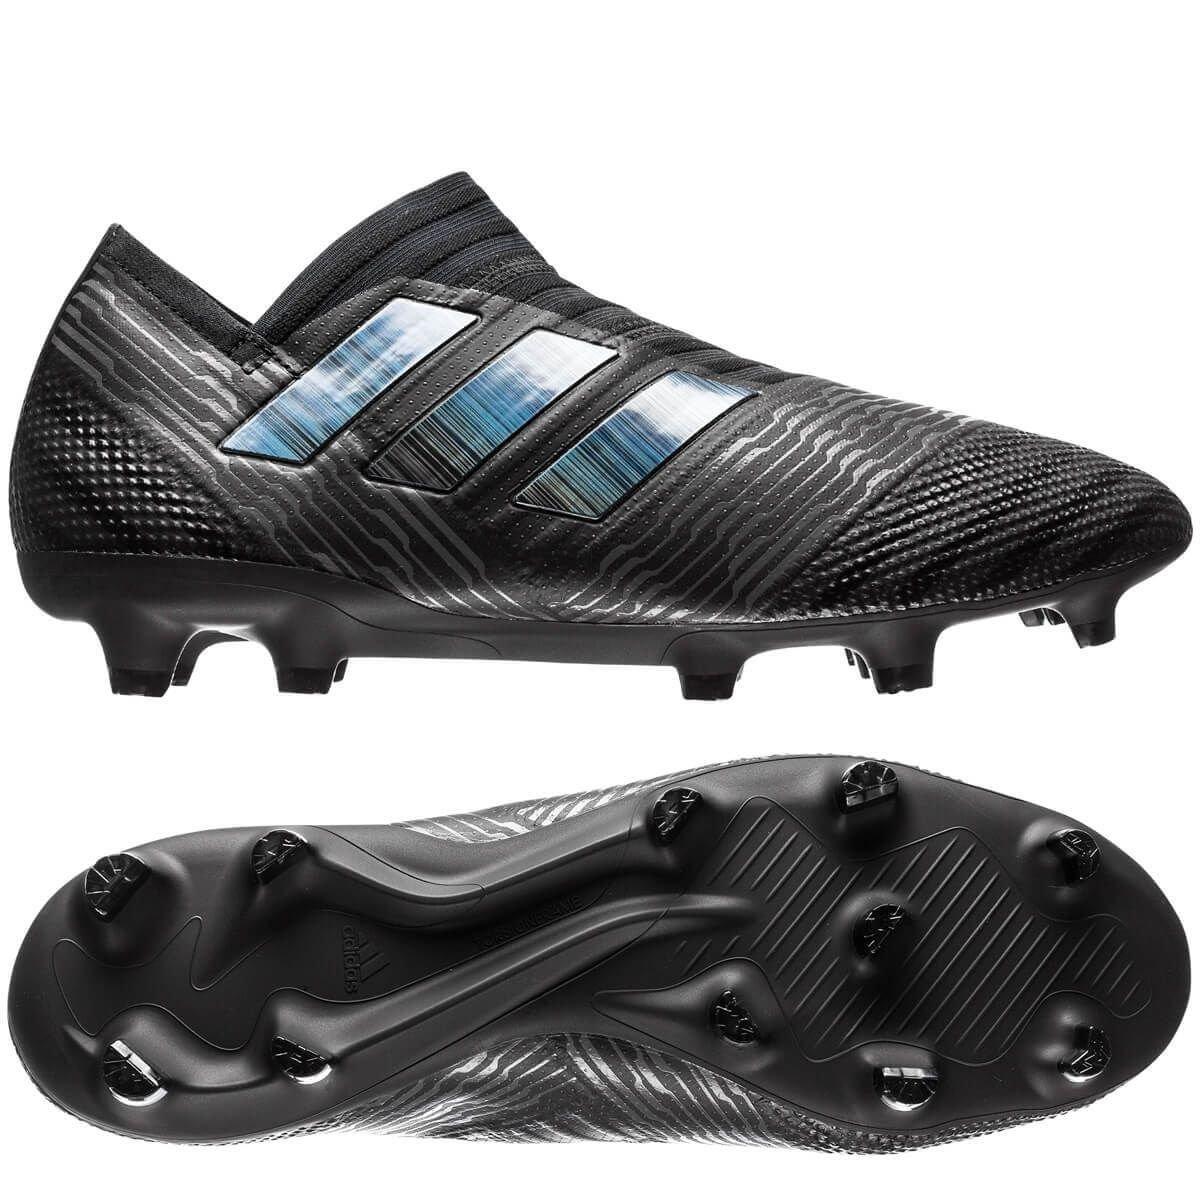 adidas Men's Nemeziz 17+ 360 Agility FG Soccer Cleats B0743H38RT 8.5 D(M) US|Coreblack/Black